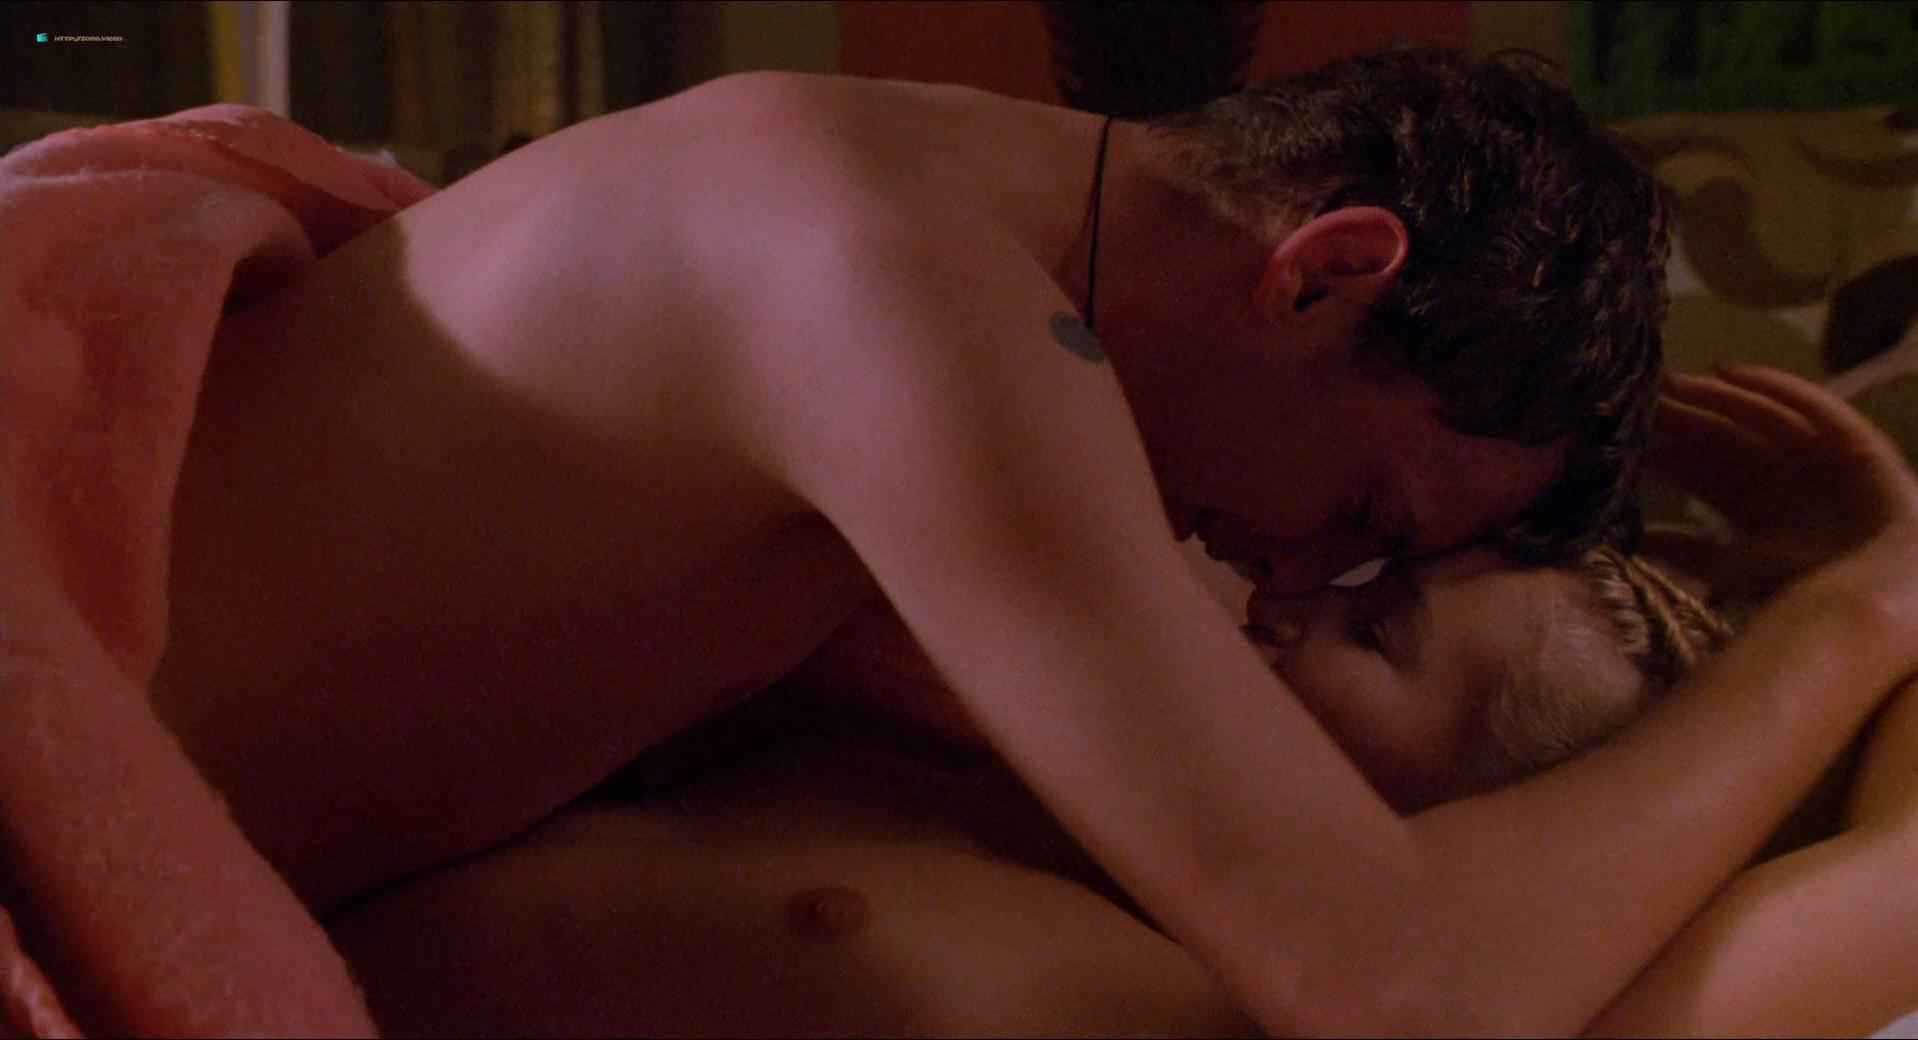 Lorraine Pilkington nude, Jan Anderson sexy - Human Traffic (1999)